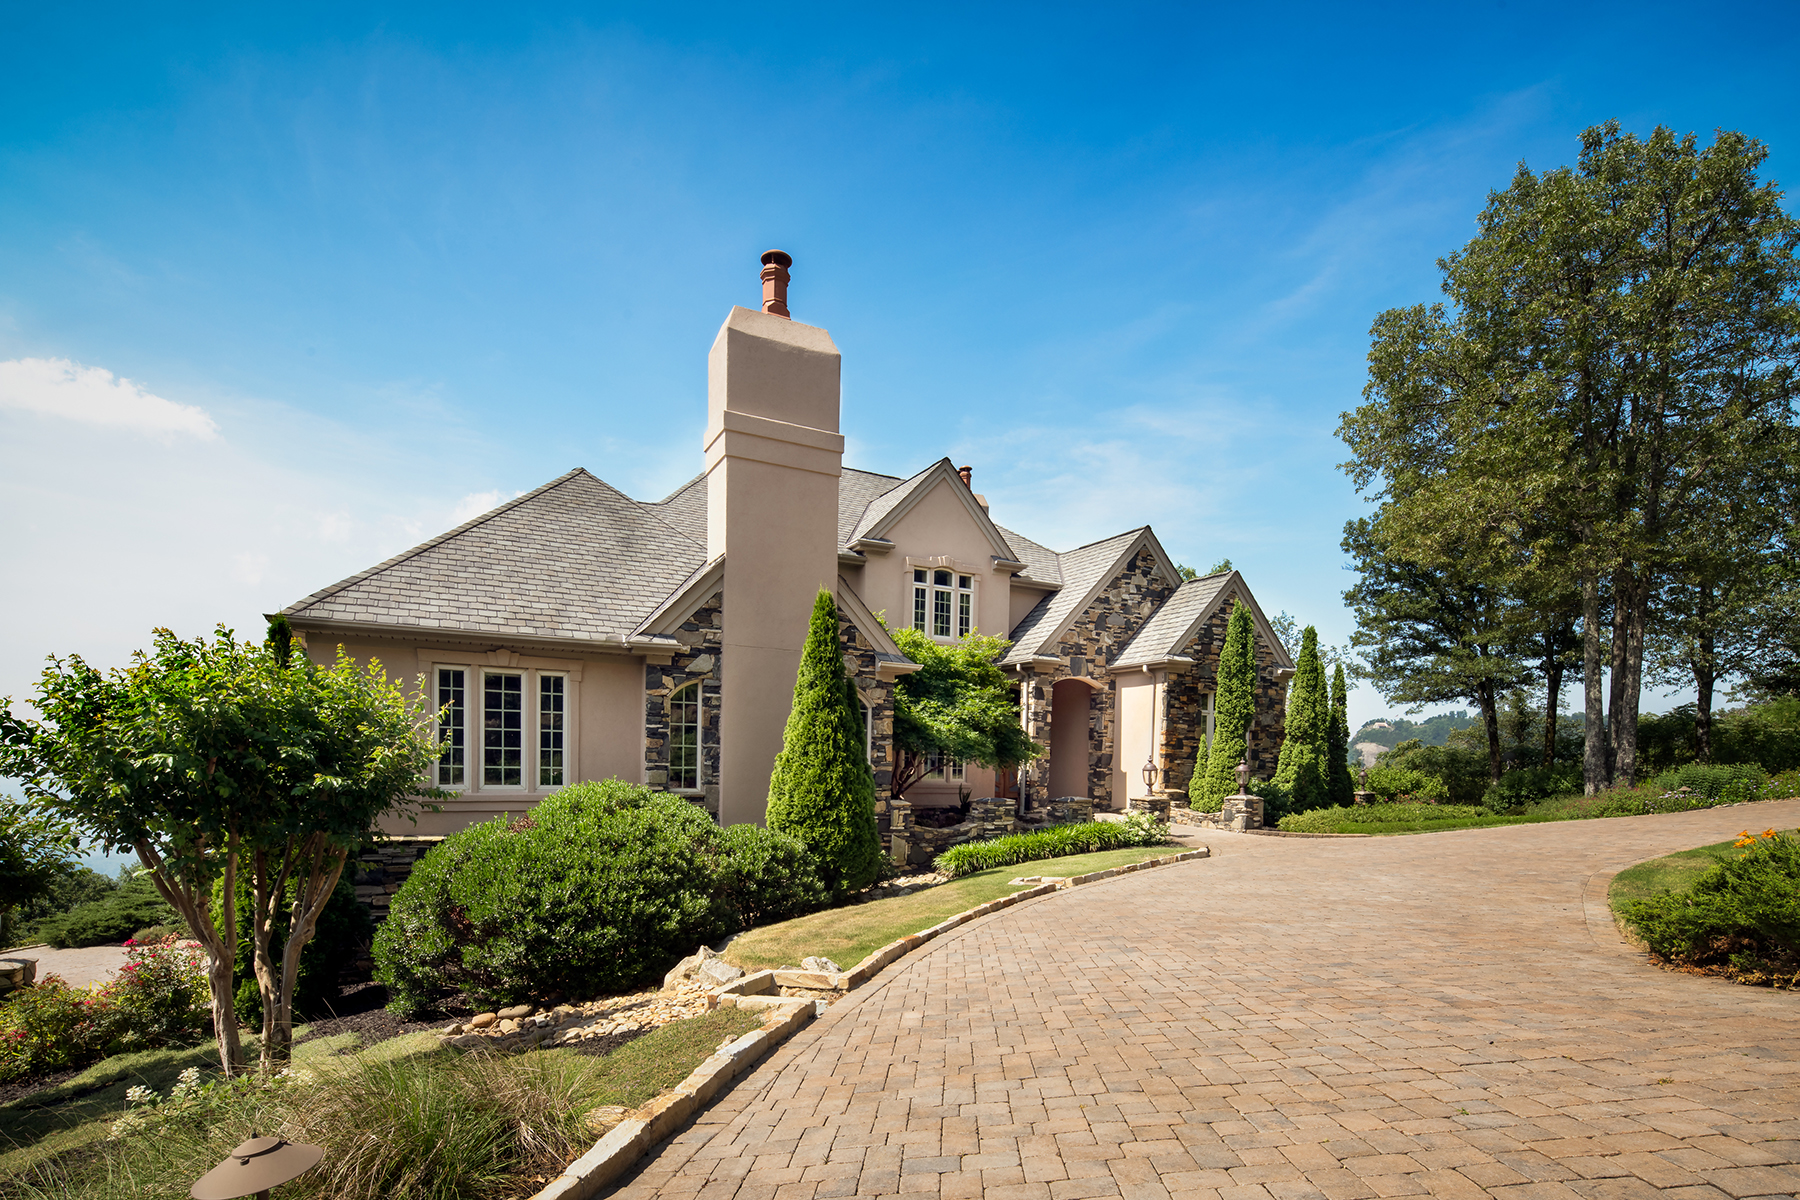 Single Family Home for Sale at THE CLIFFS AT GLASSY 4 Lobelia Way Landrum, South Carolina, 29356 United States